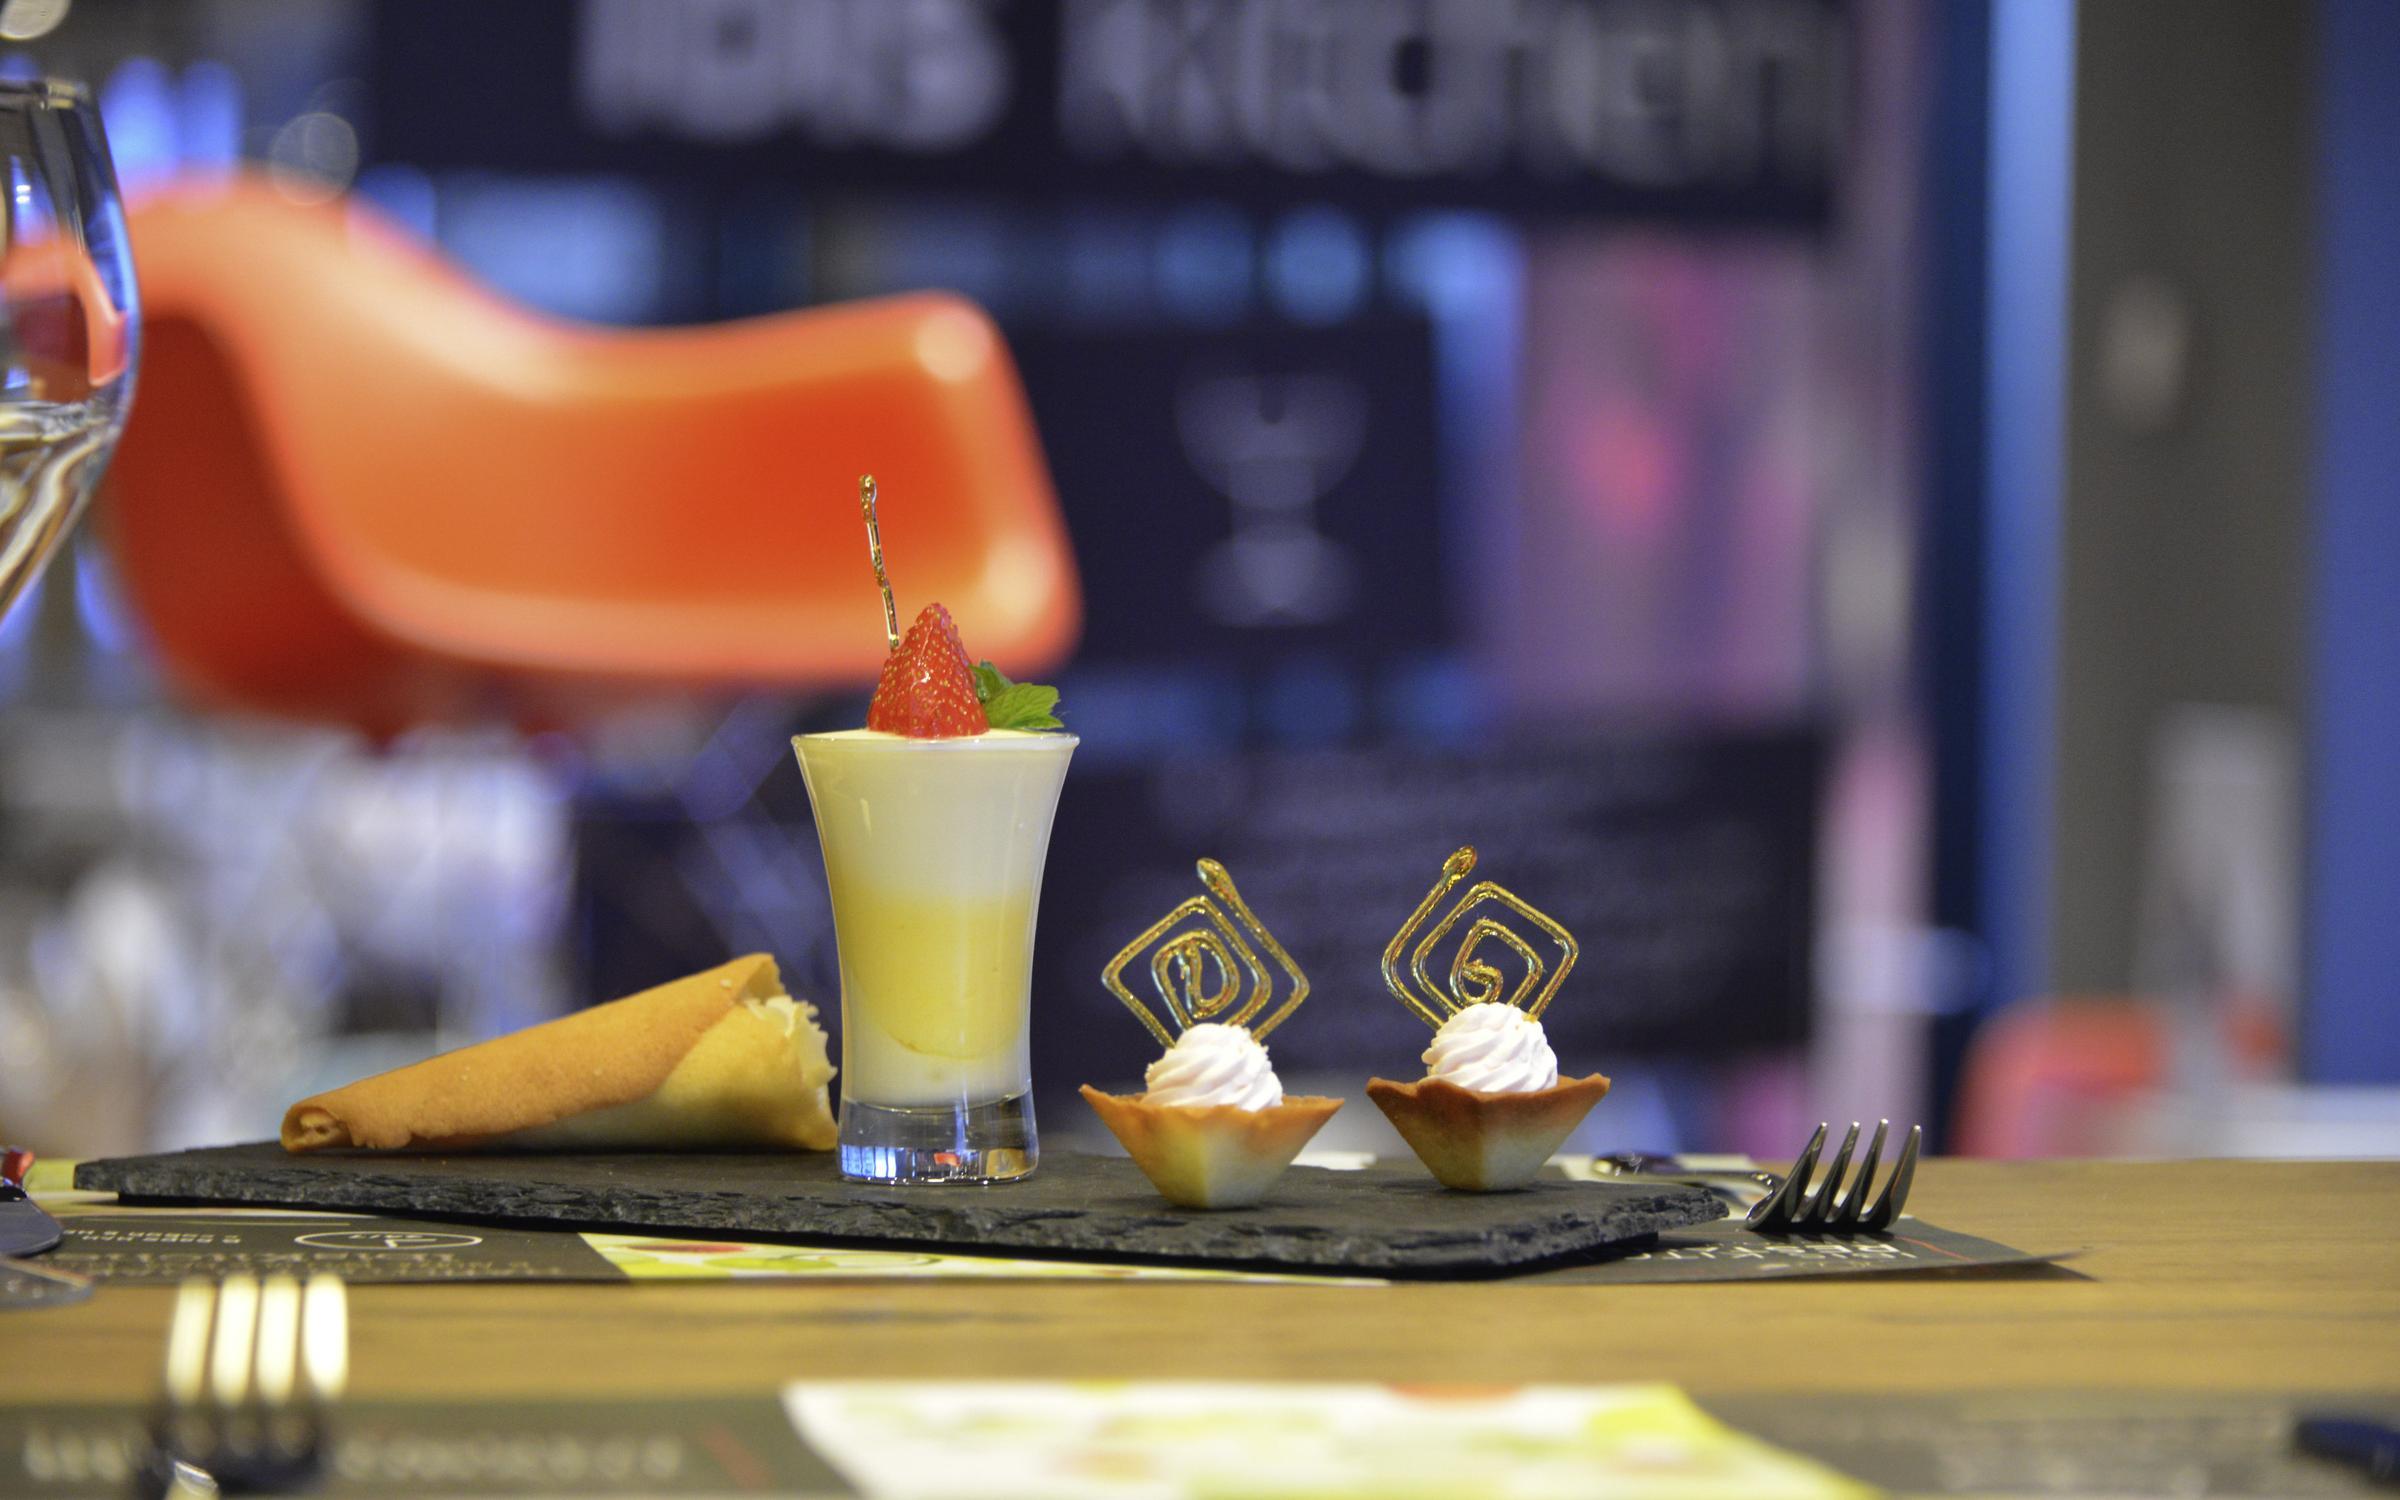 фотография Ресторана Ibis kitchen на Красноармейской улице